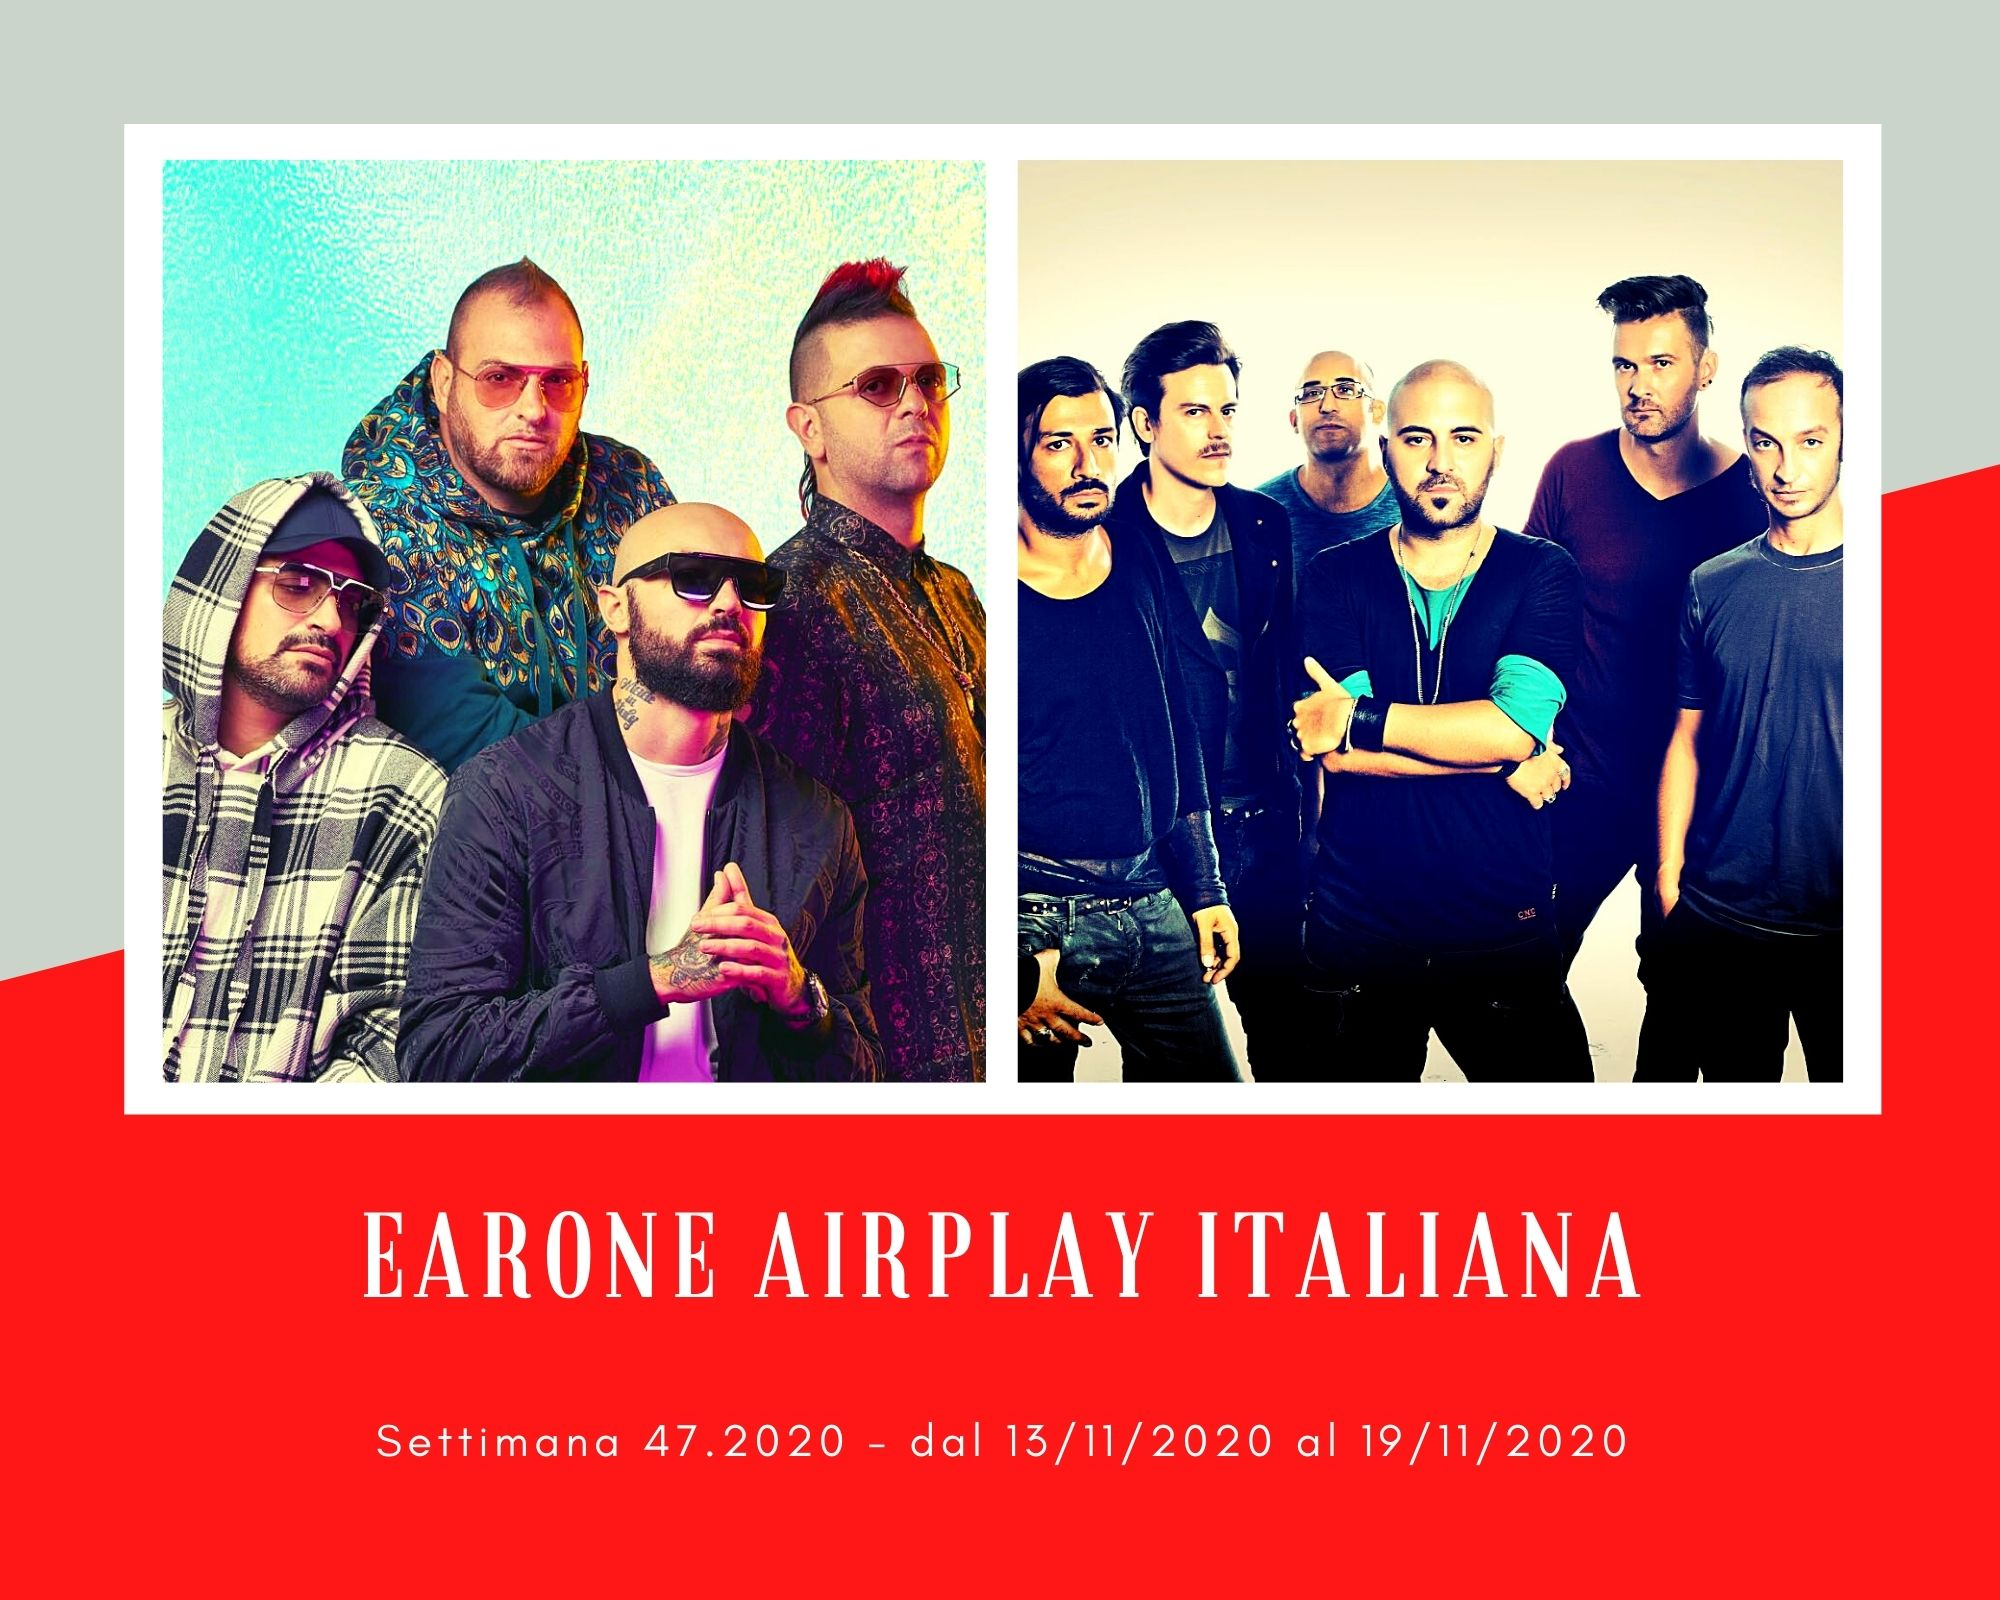 Classifica Radio EARONE Airplay Italiana, week 47. I Boomdabash puntano la vetta occupata dai Negramaro